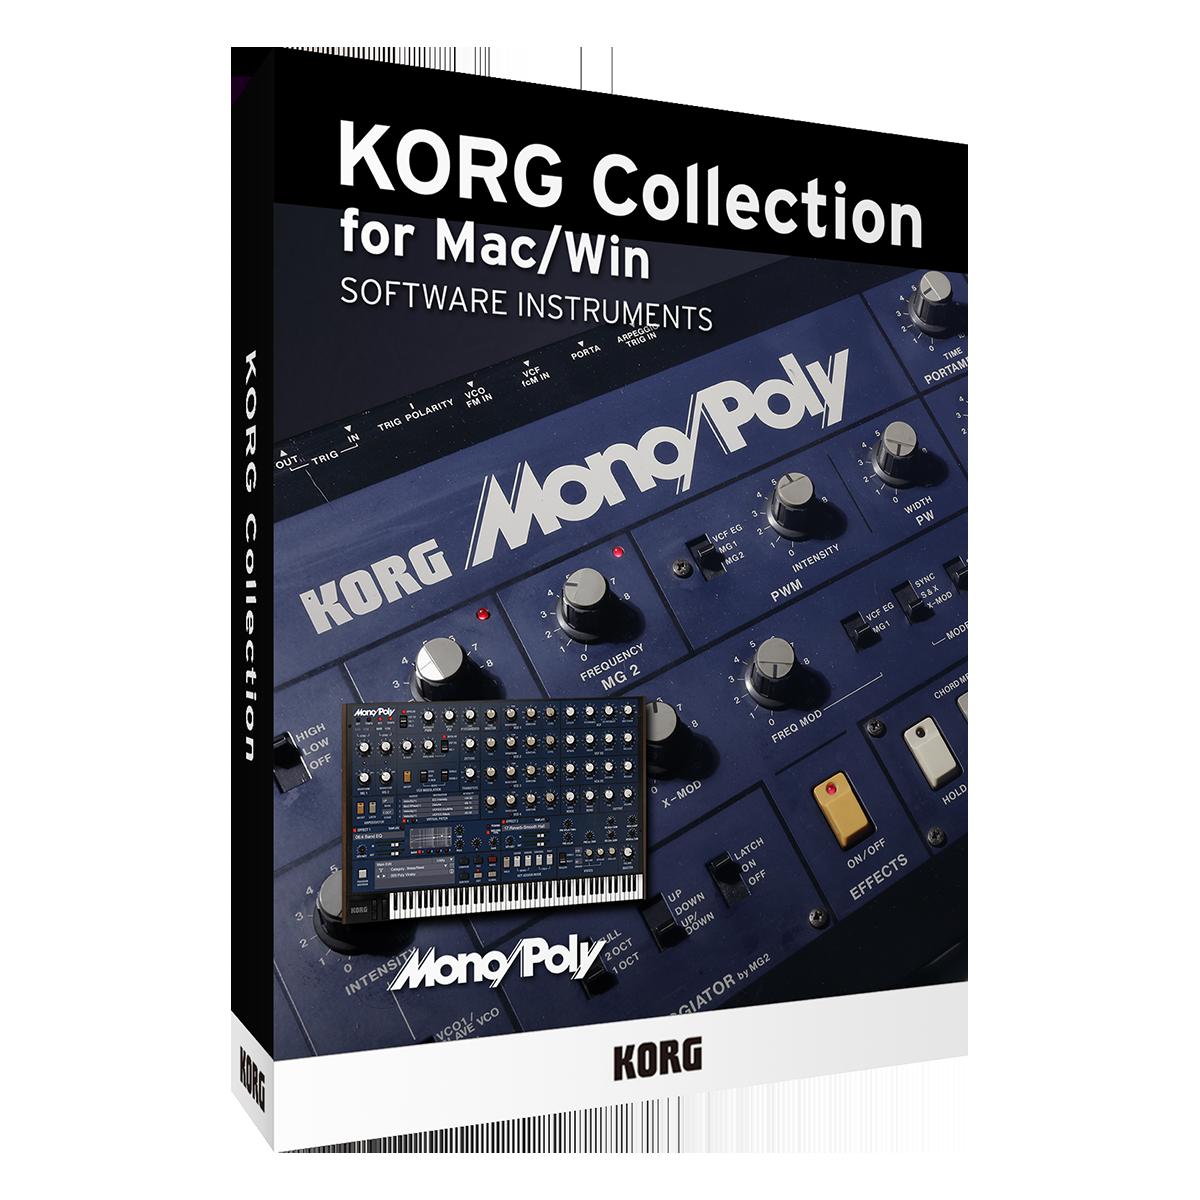 KORG Collection 3 - Mono/Poly